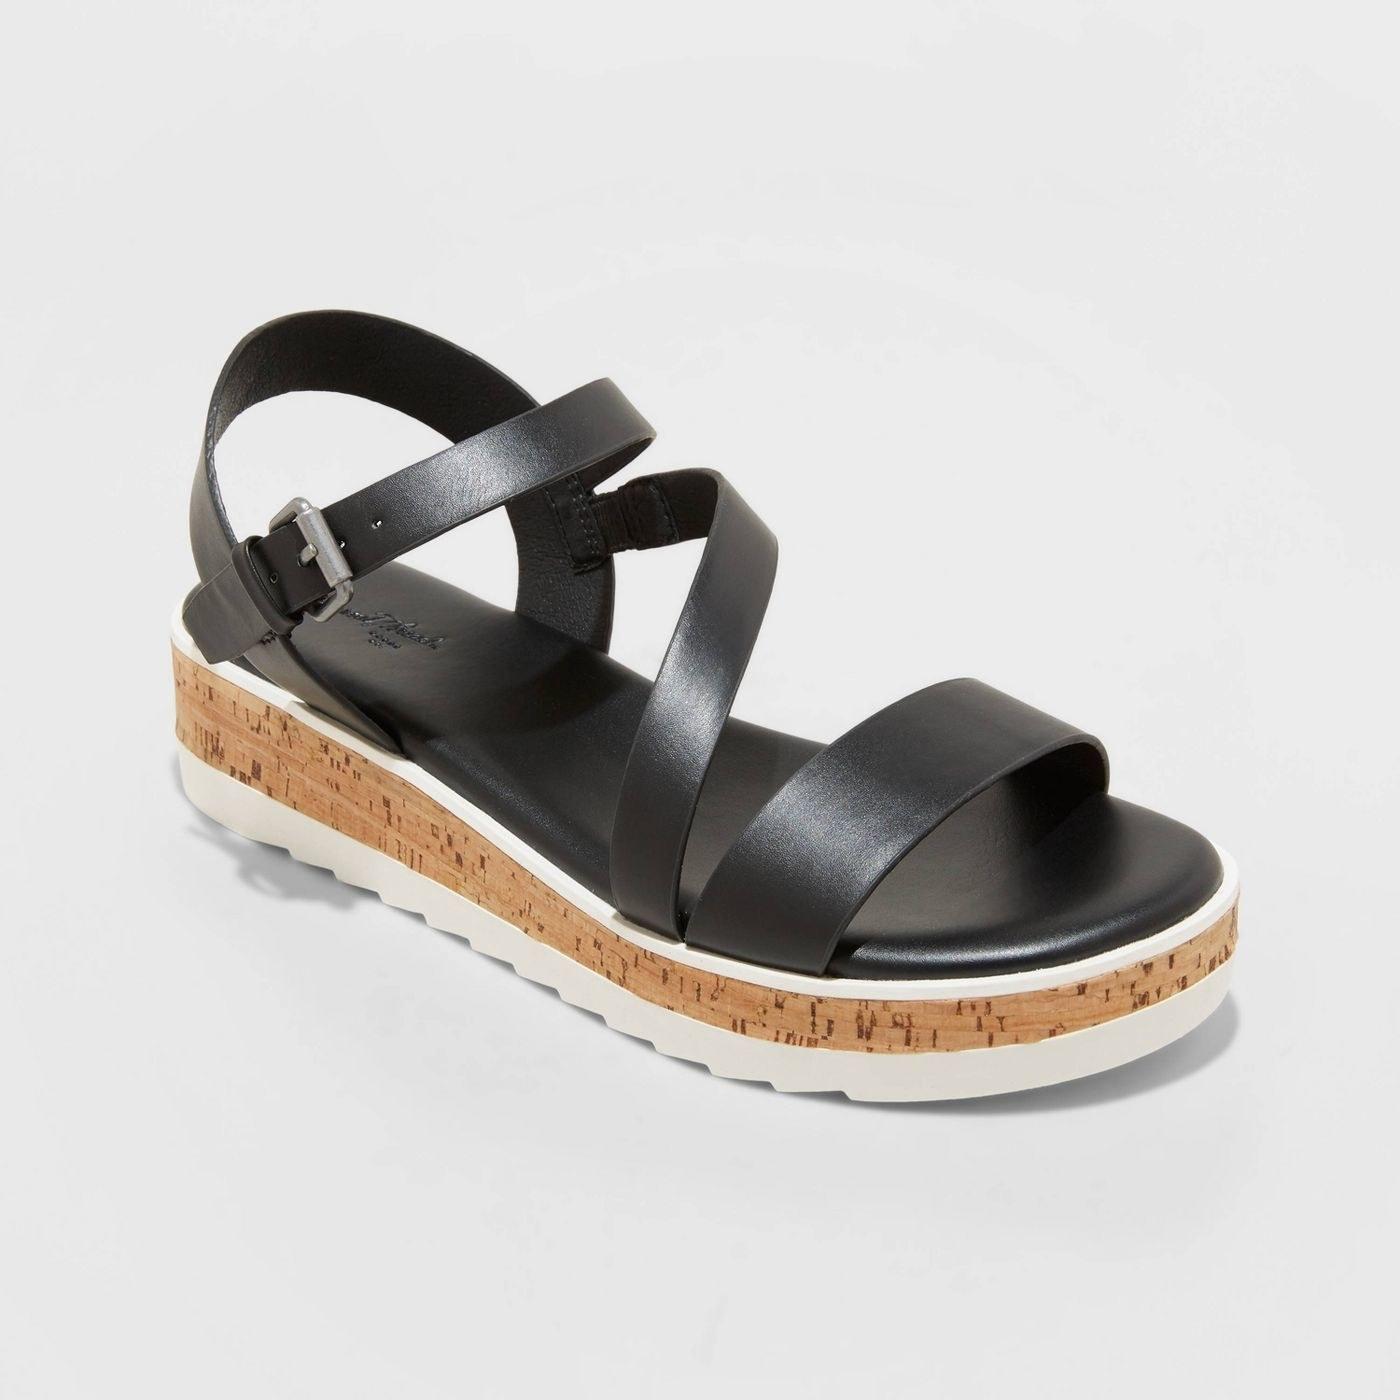 Black sandal with a thick platform sole